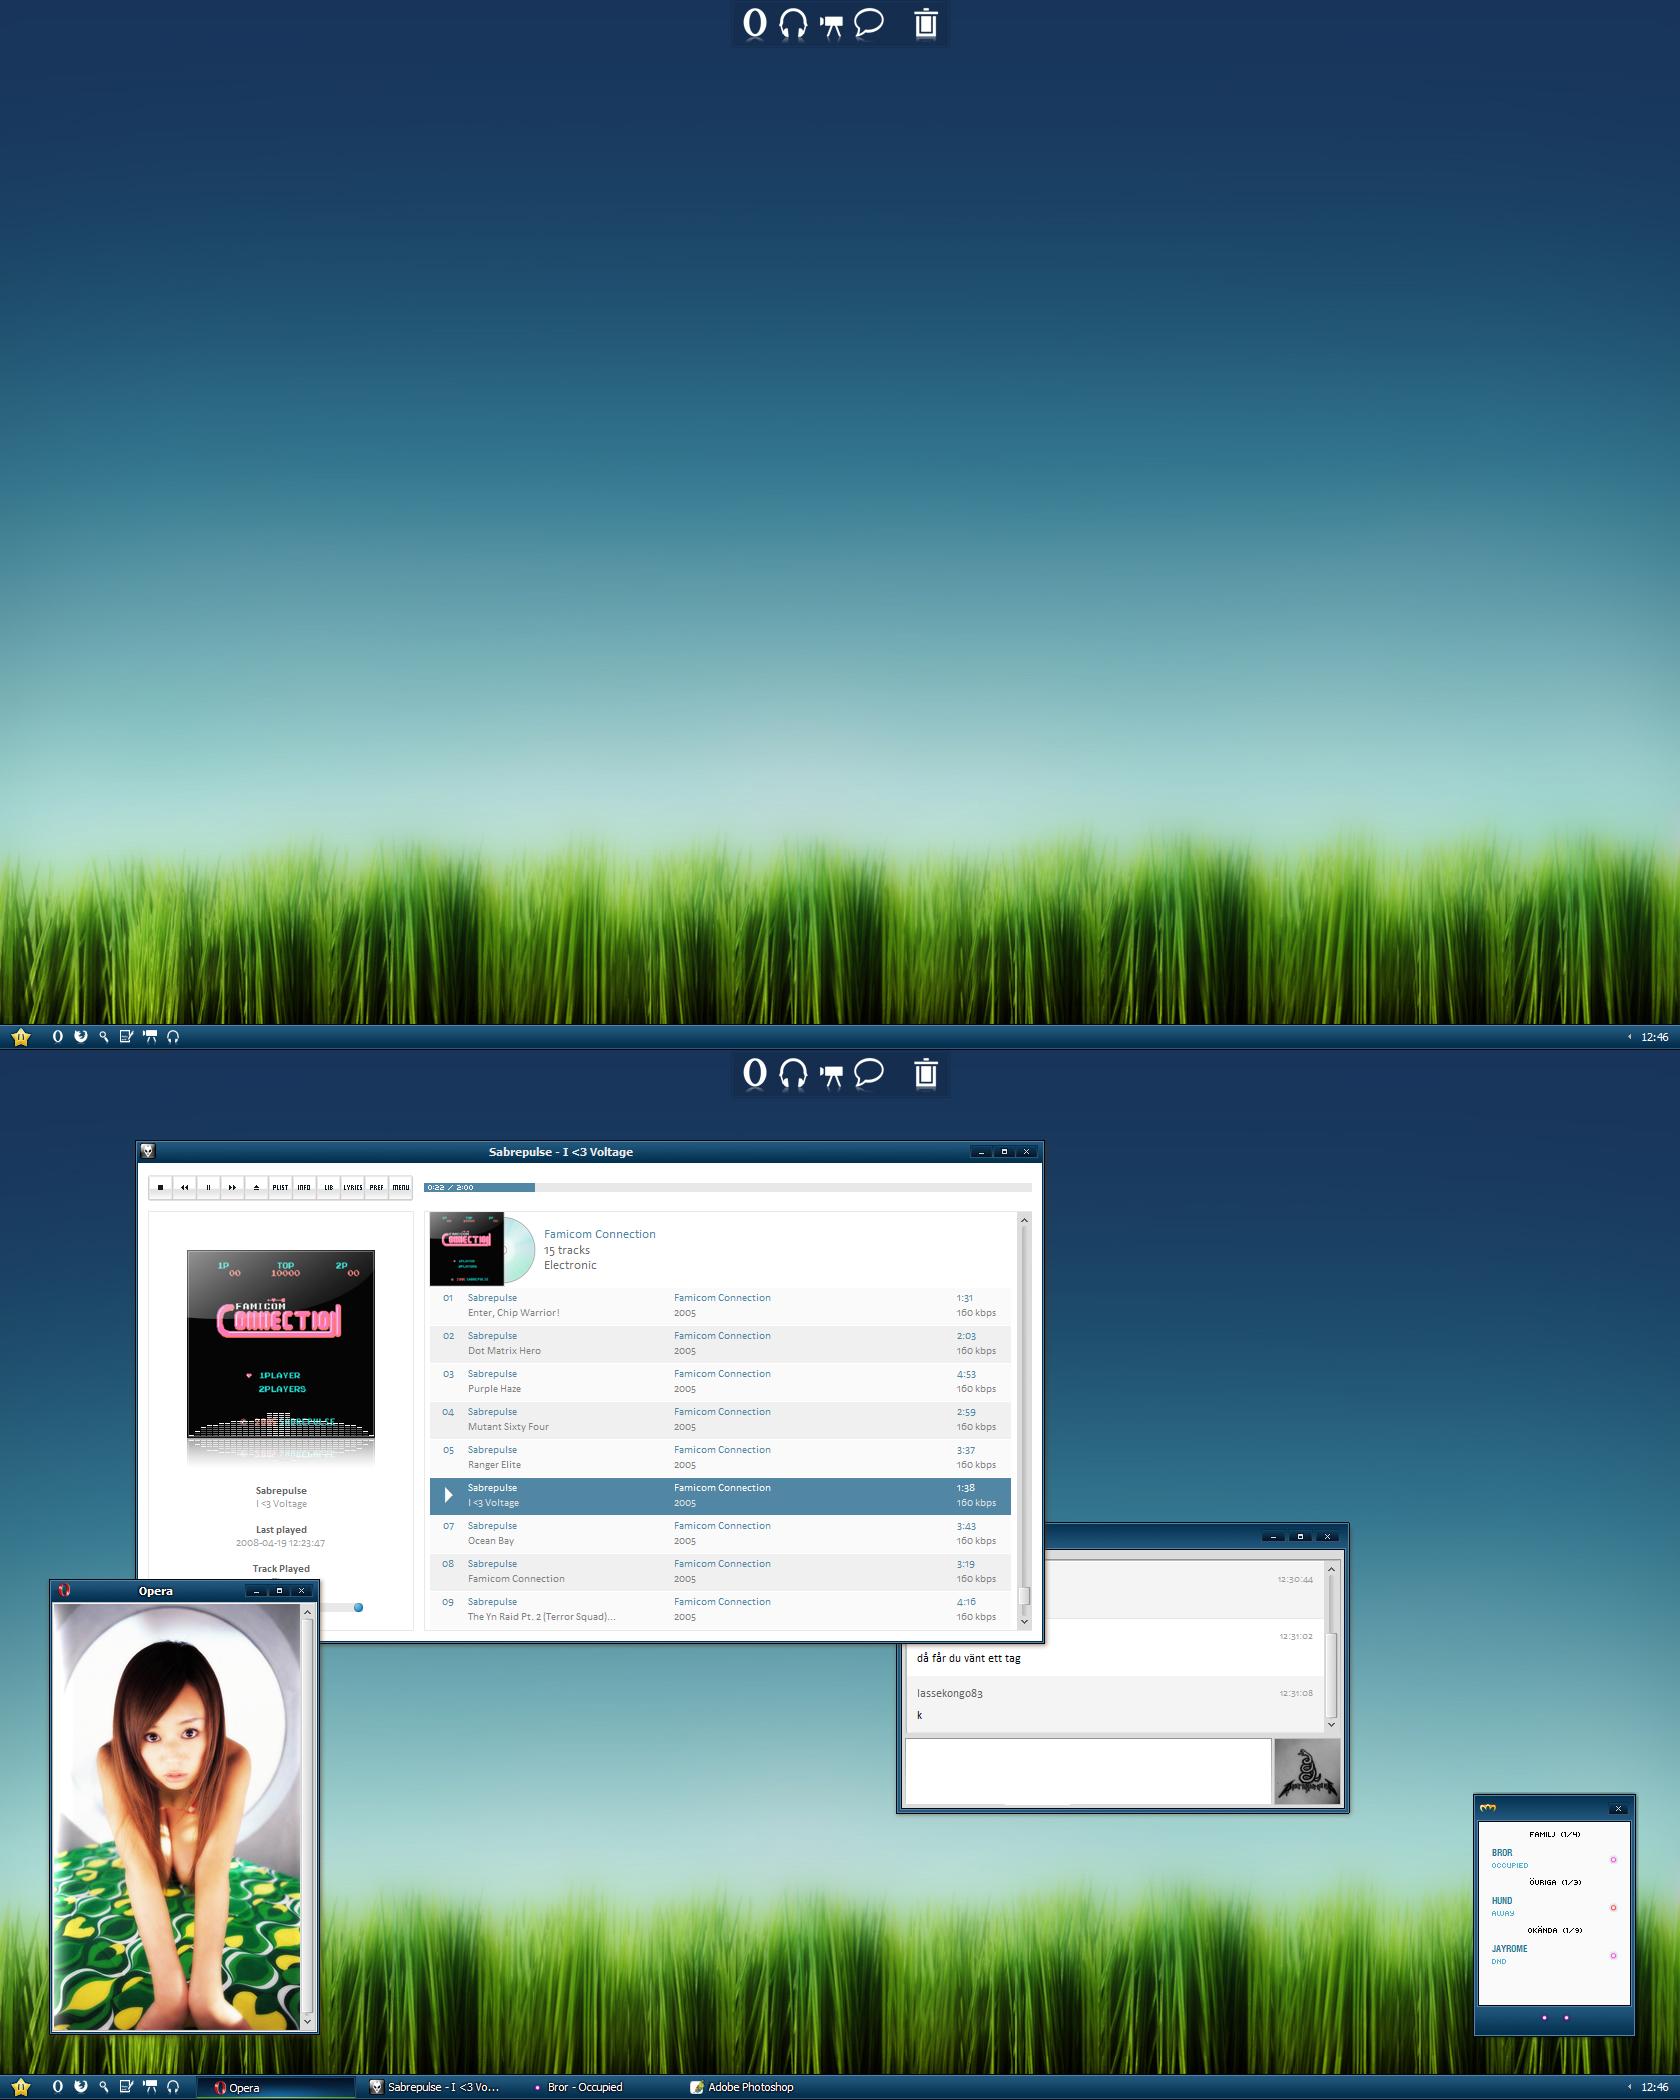 Desktop April 2008 by lassekongo83